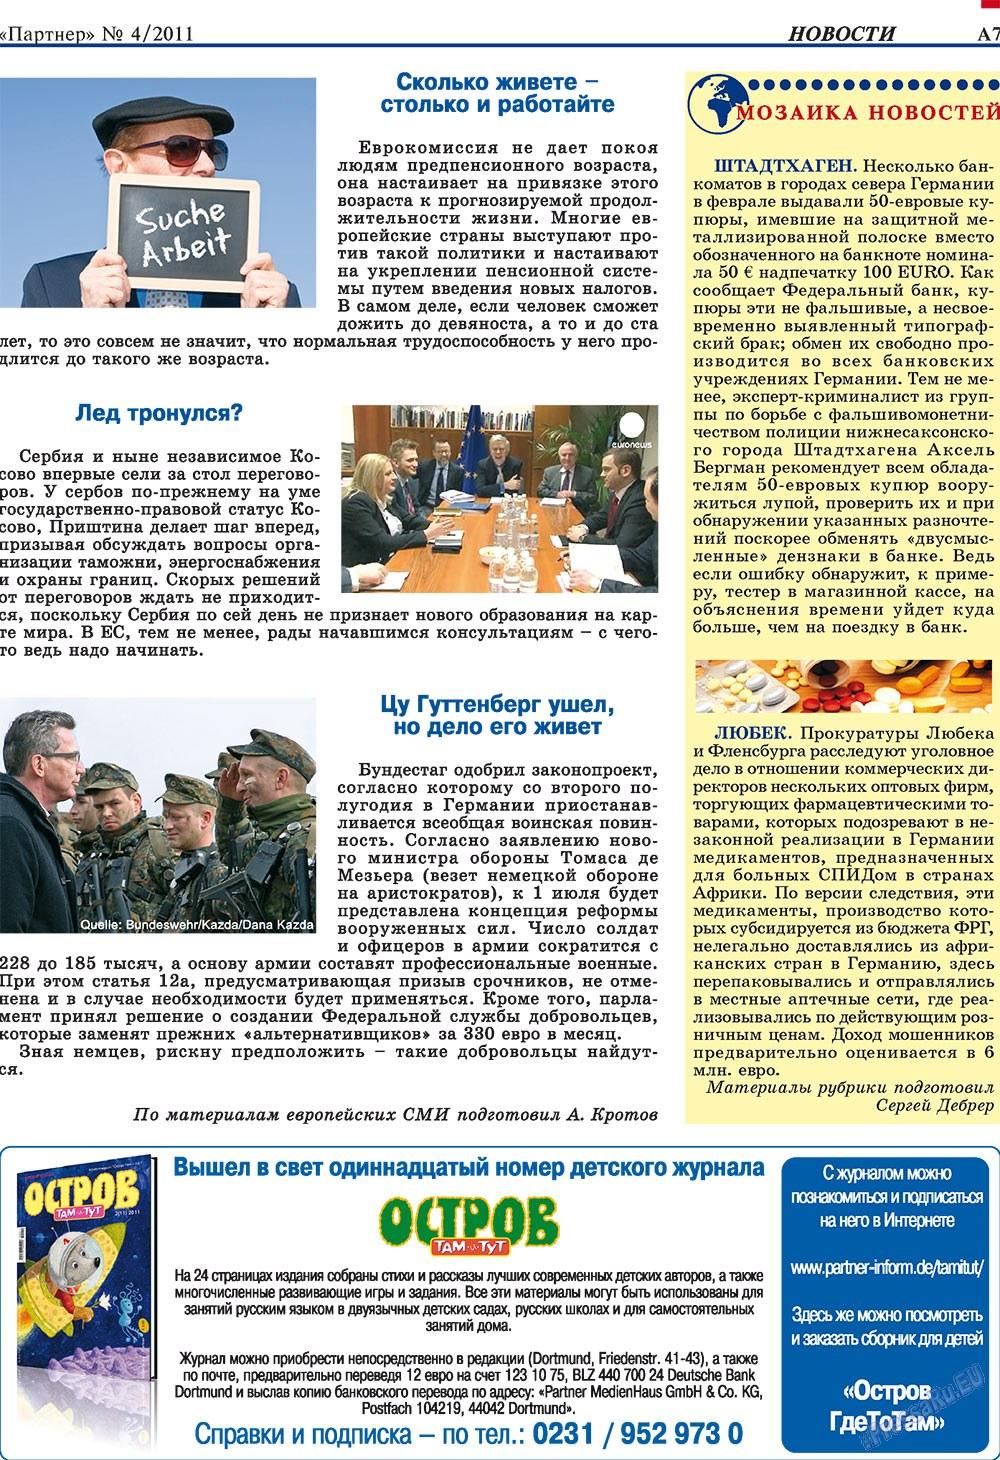 Партнер-север (журнал). 2011 год, номер 4, стр. 7